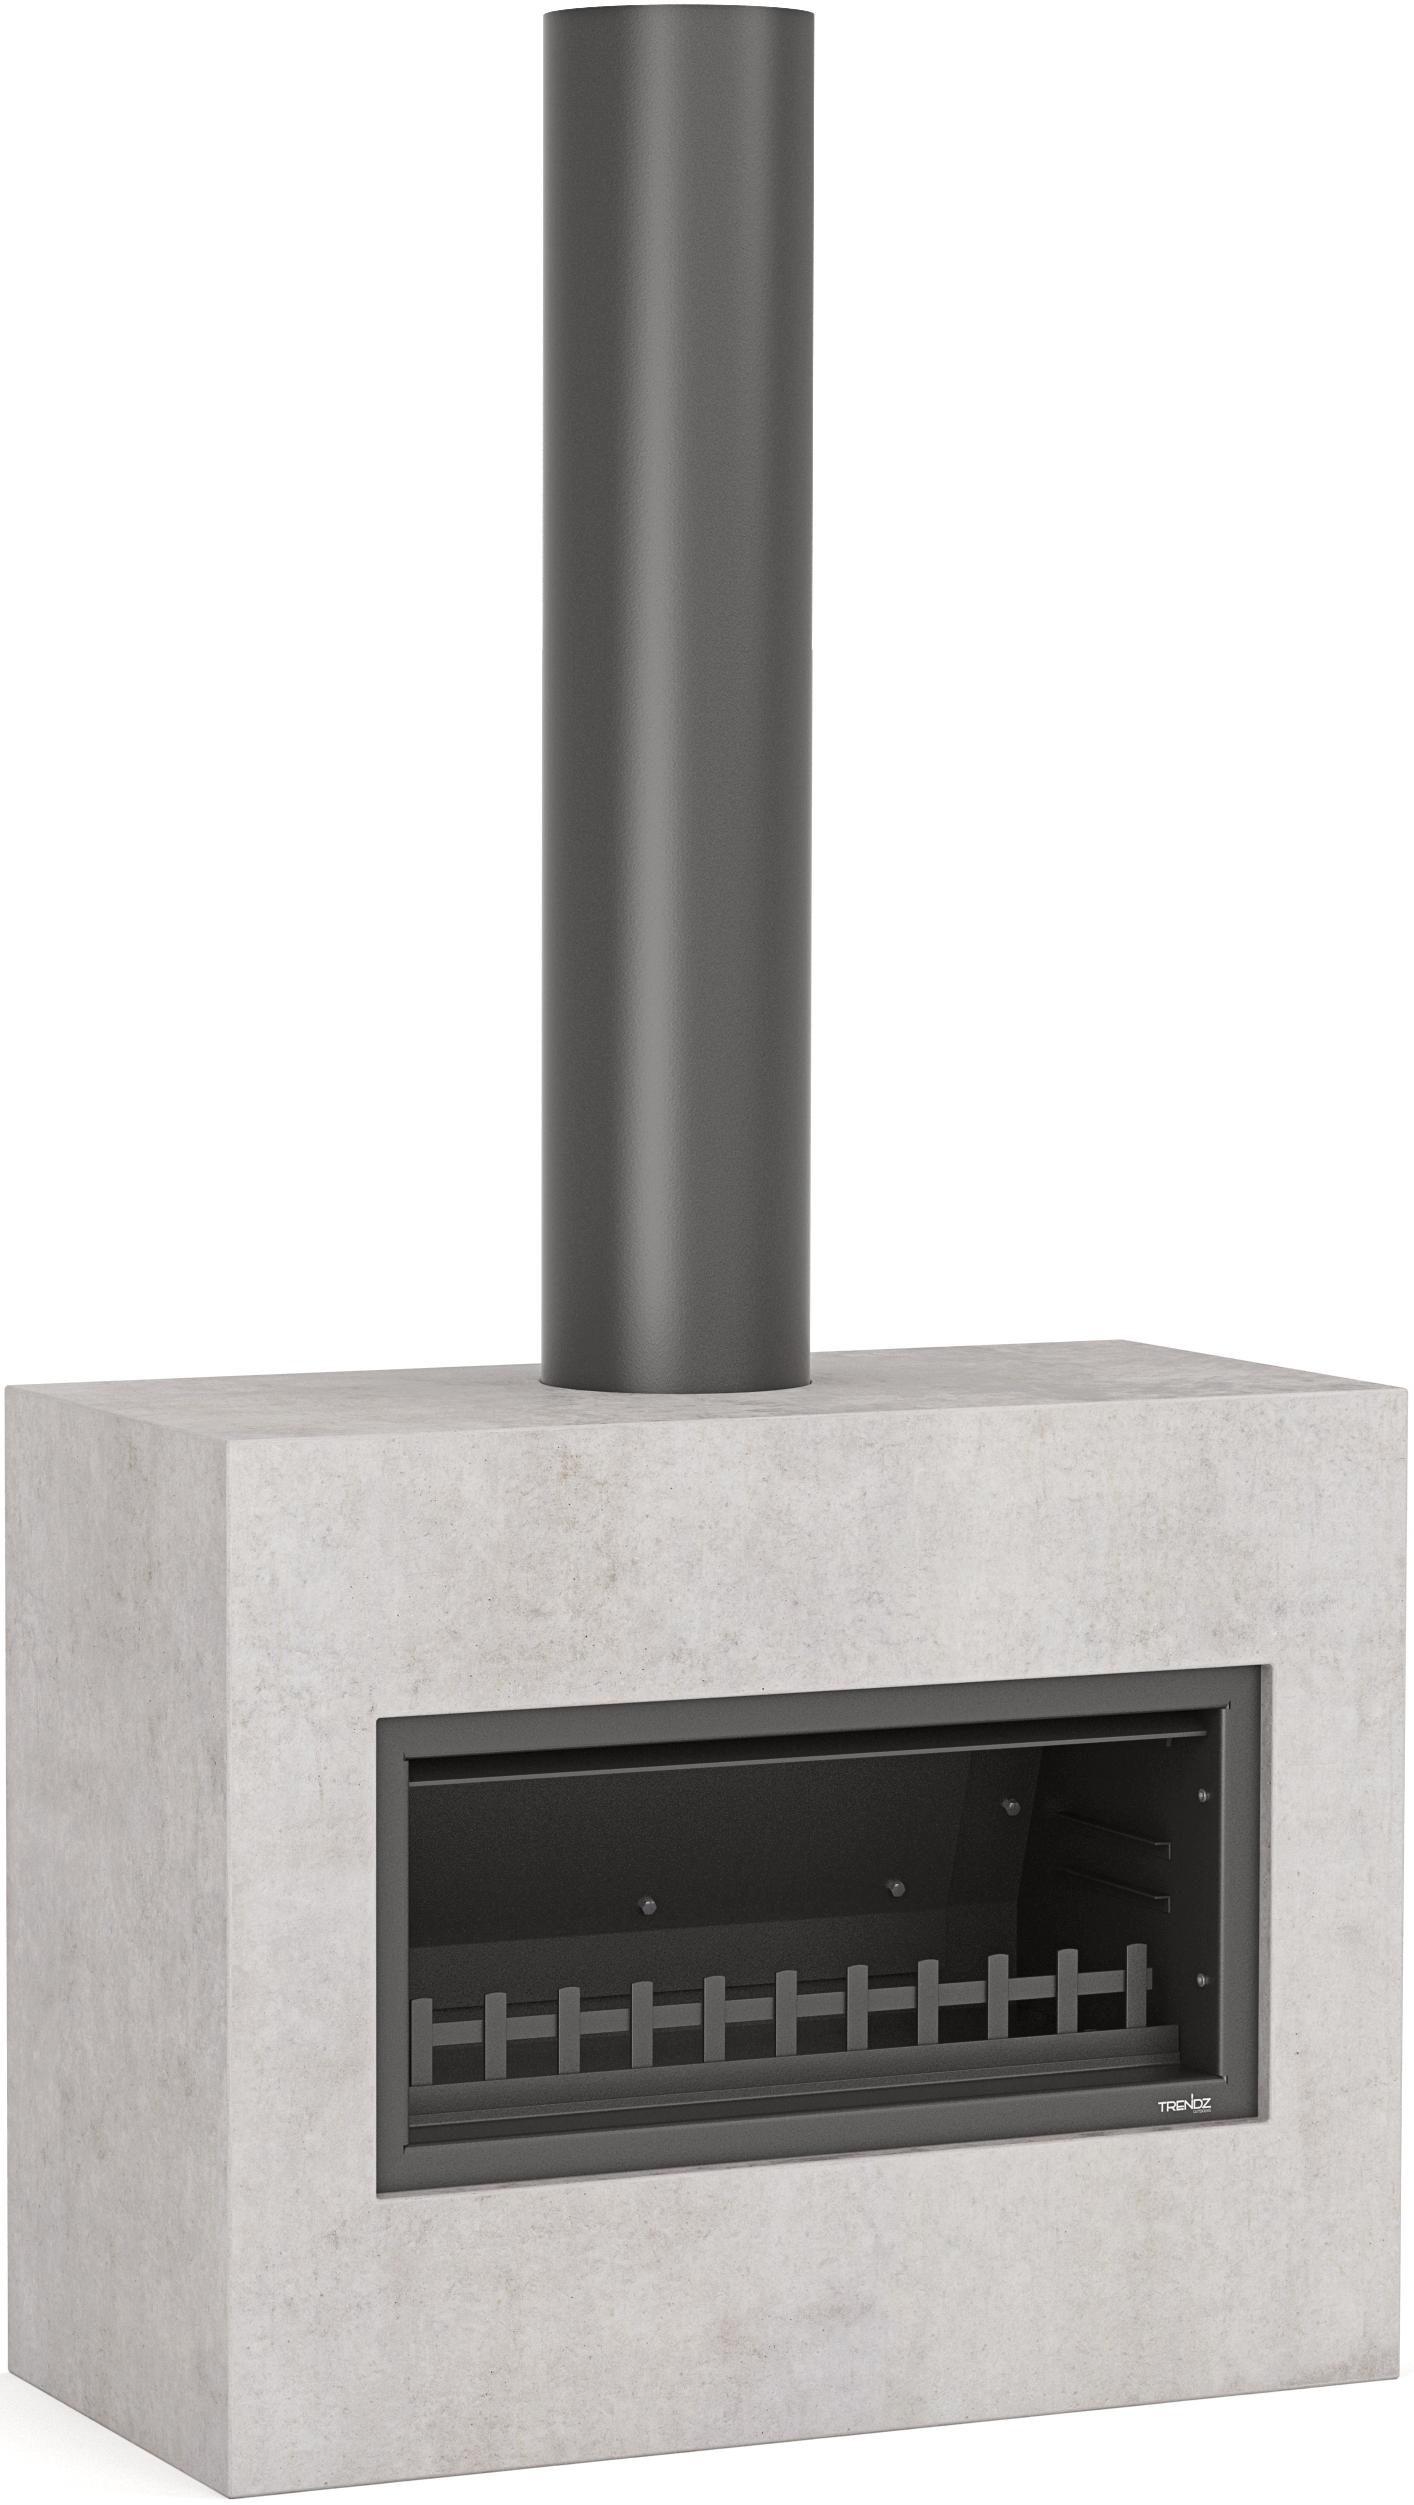 Trendz outdoor fireplace in the Mini Burton design